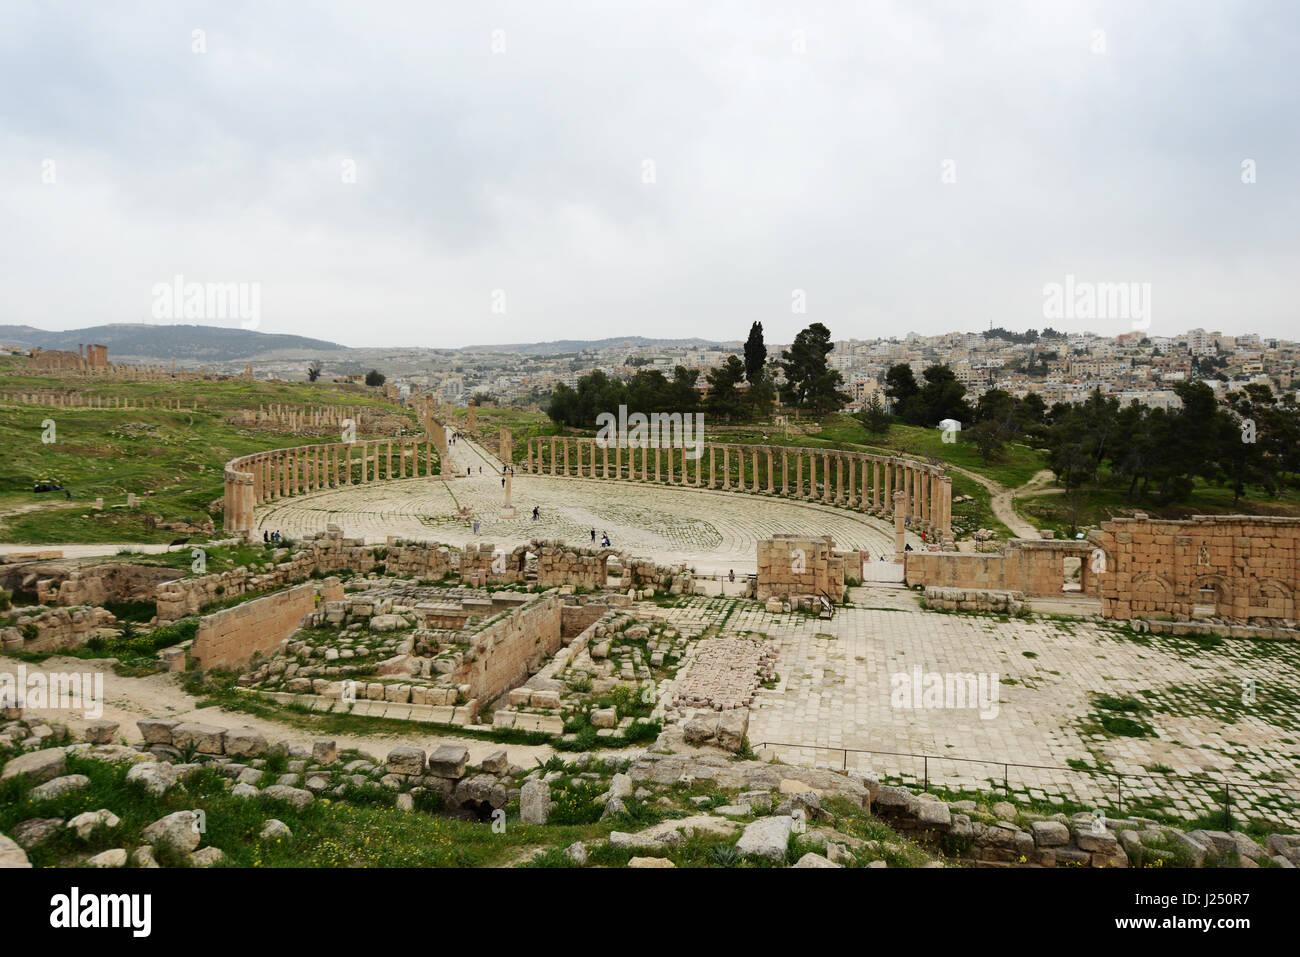 The Forum plaza in the ancient Roman city of Jerash in Jordan. - Stock Image